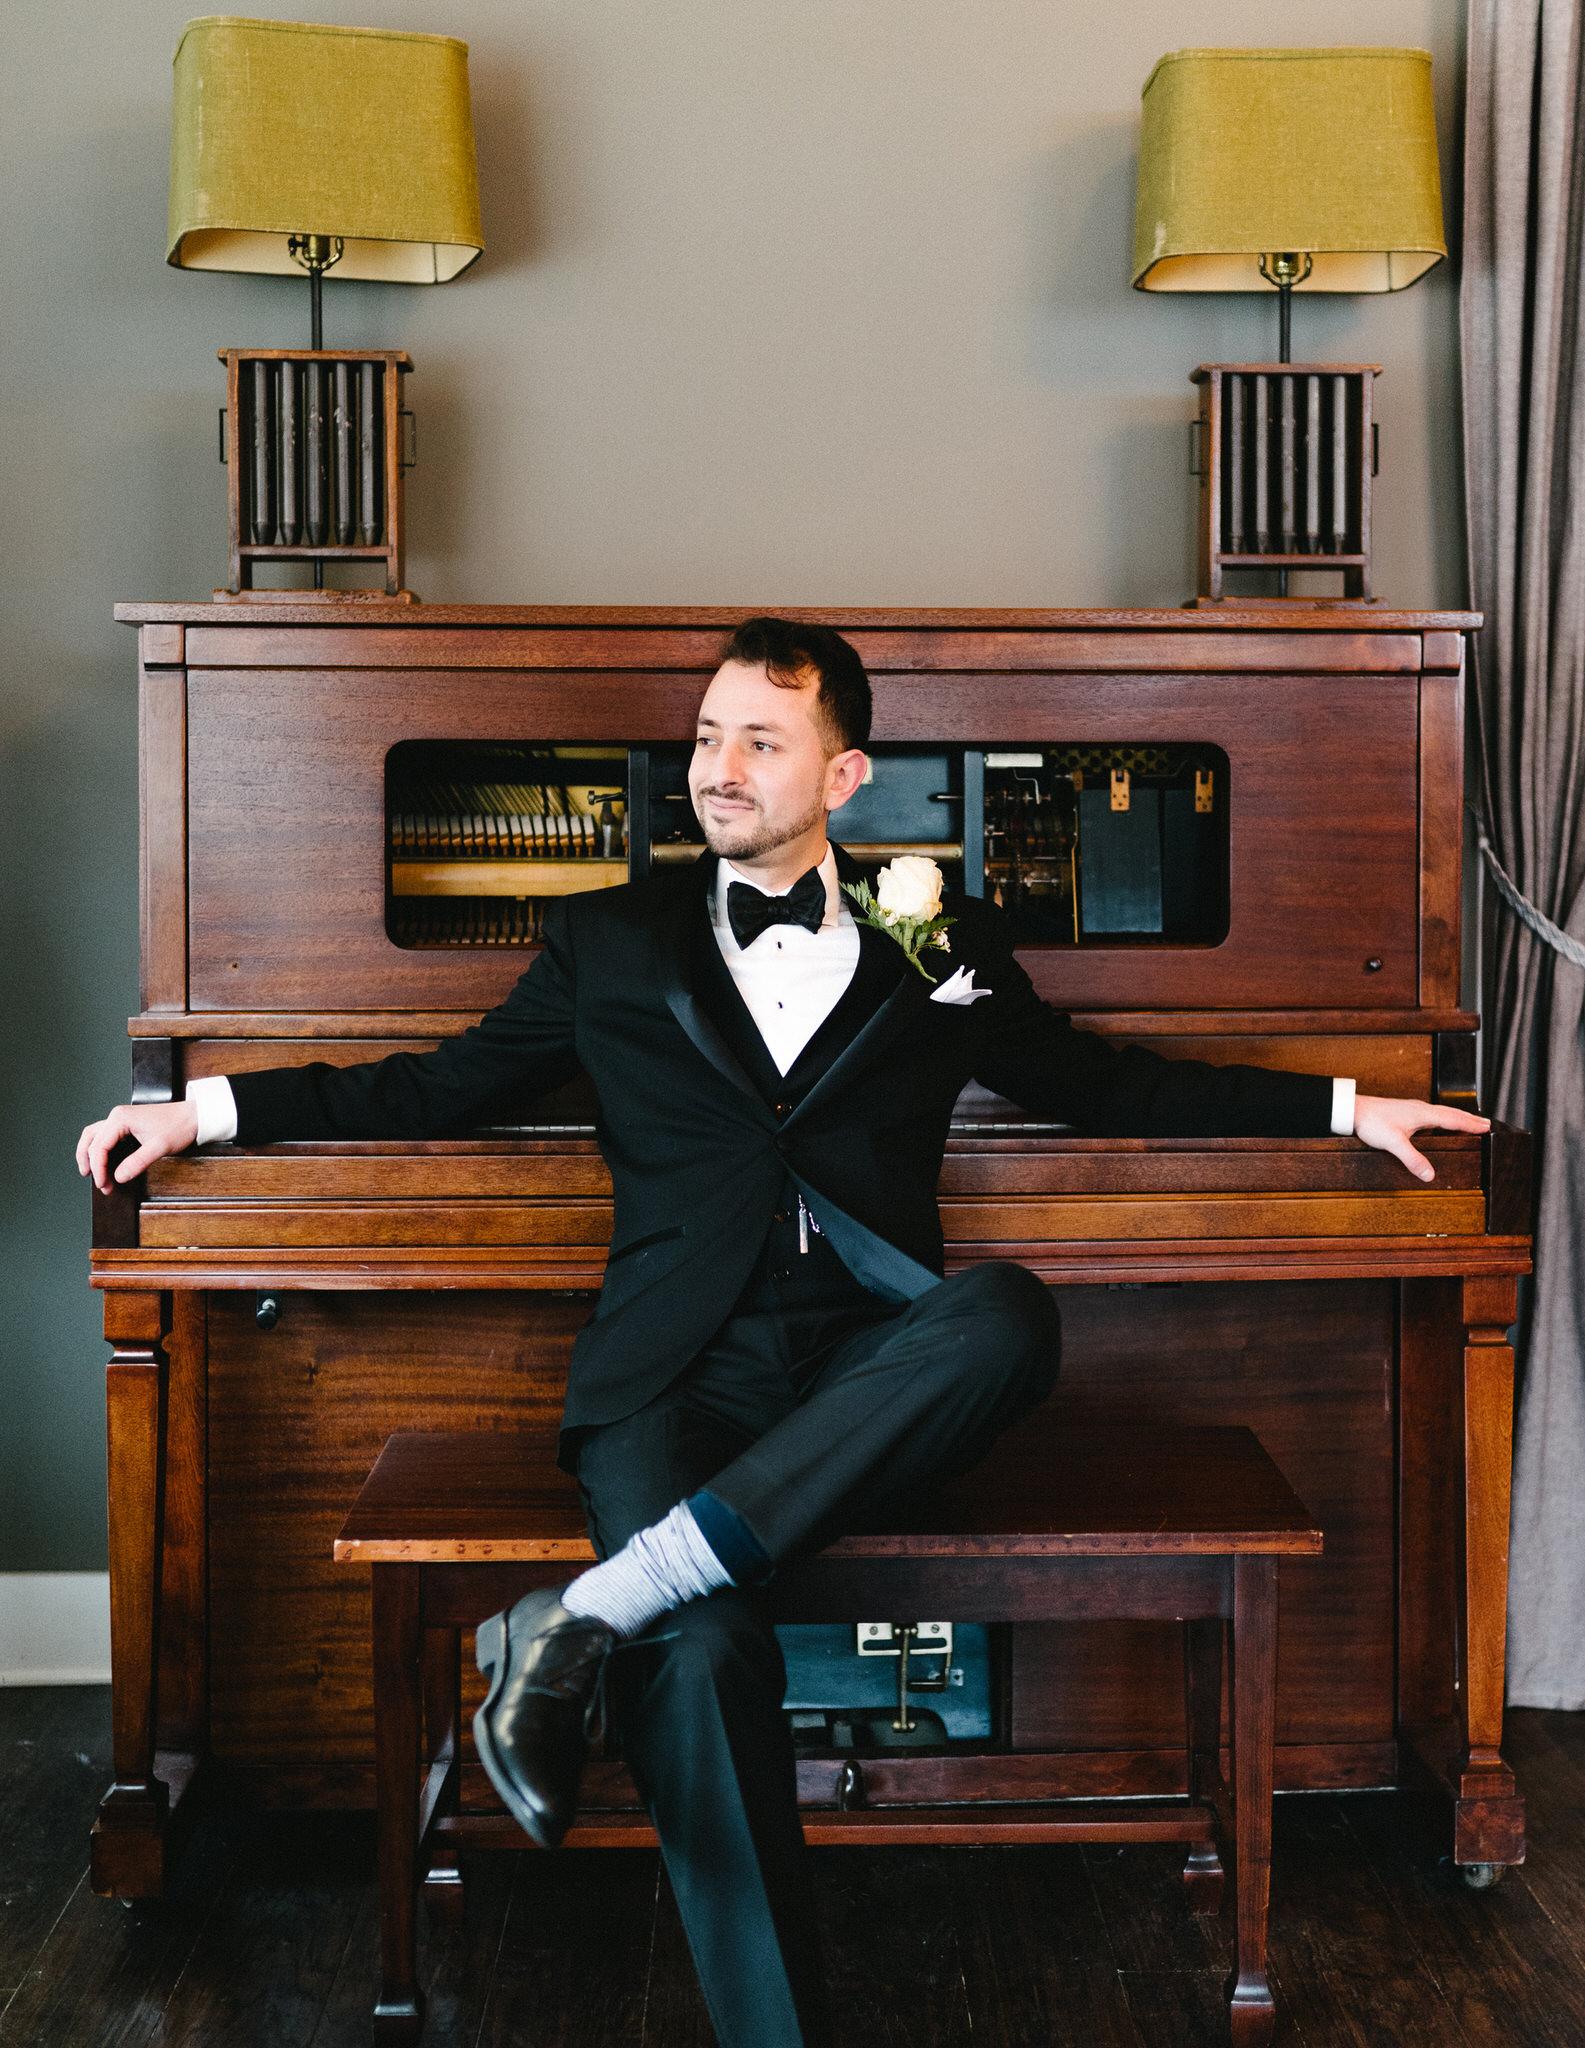 028-rempel-photography-chicago-wedding-inspiration-susan-daniel-michigan-metro-detroit-christian-church-holly-vault-cupcakes-and-kisses.jpg